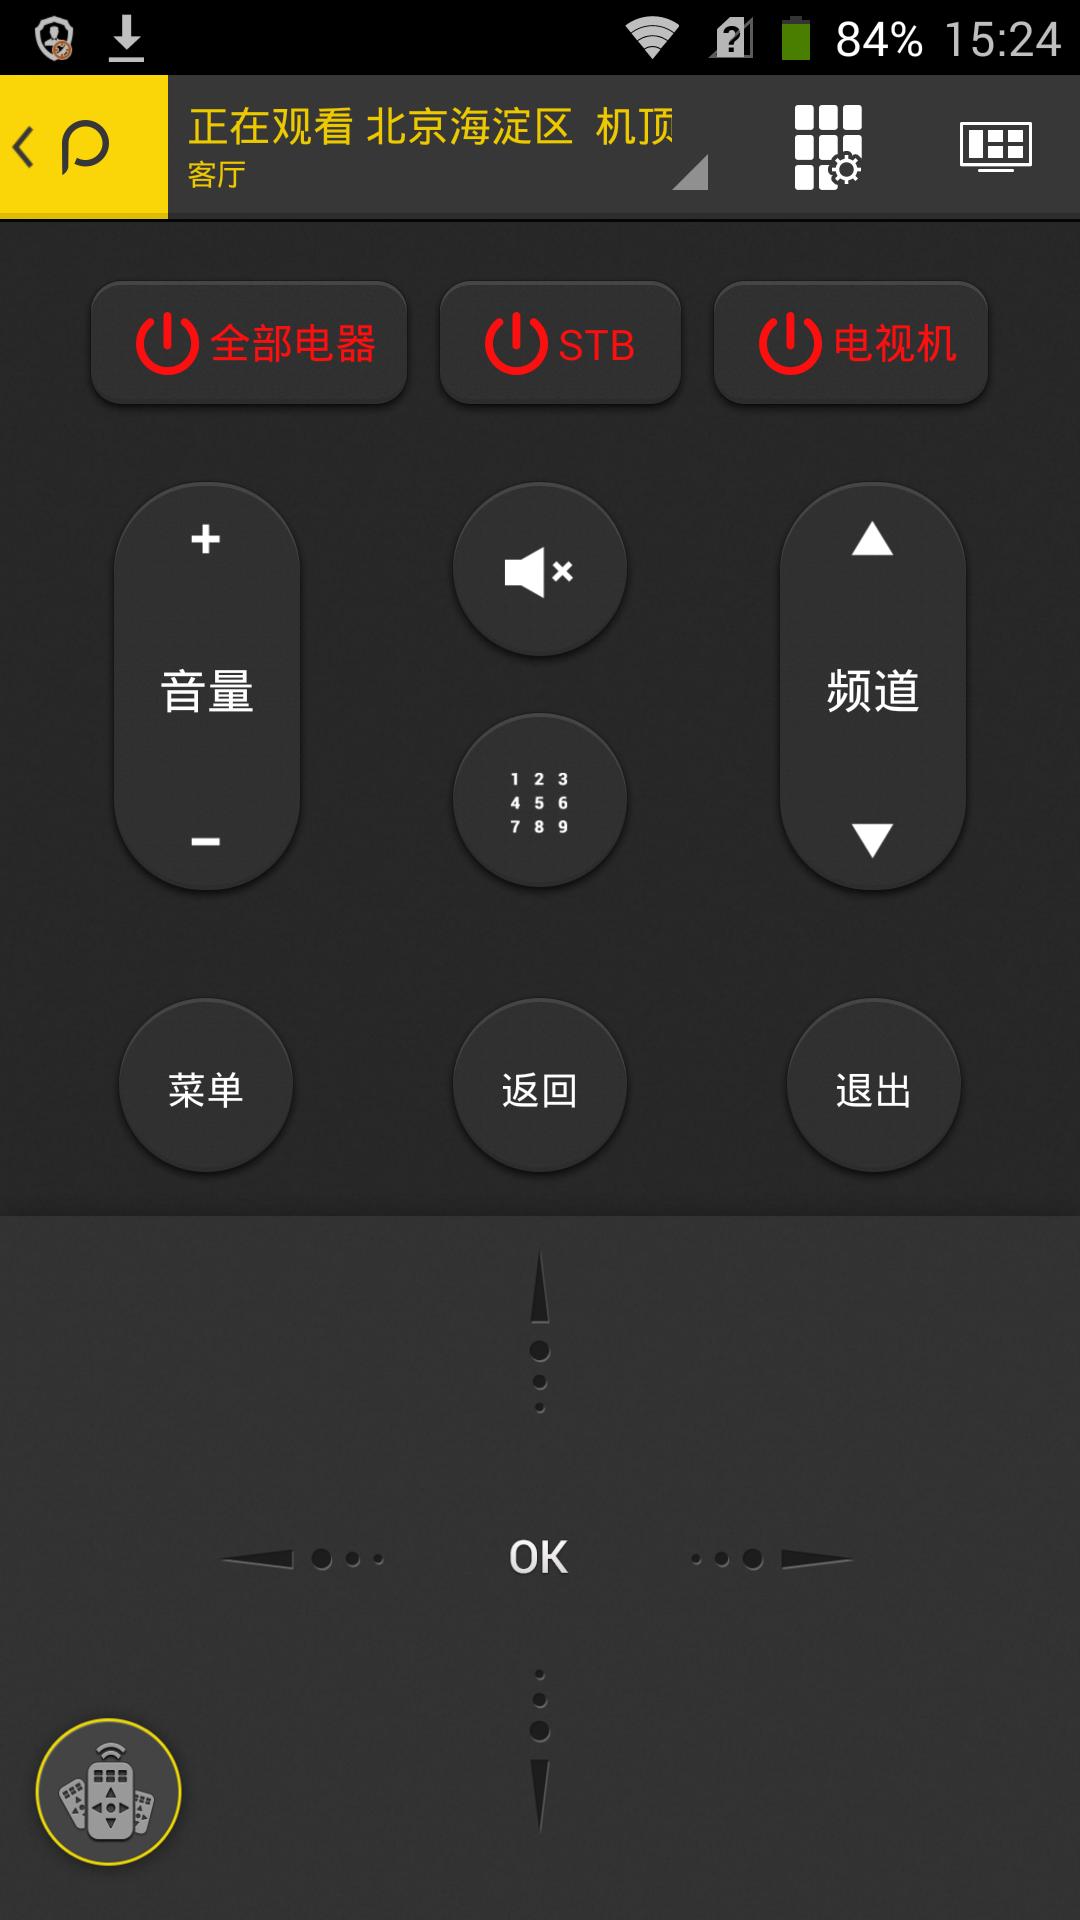 Screenshot_2014-09-18-15-24-25